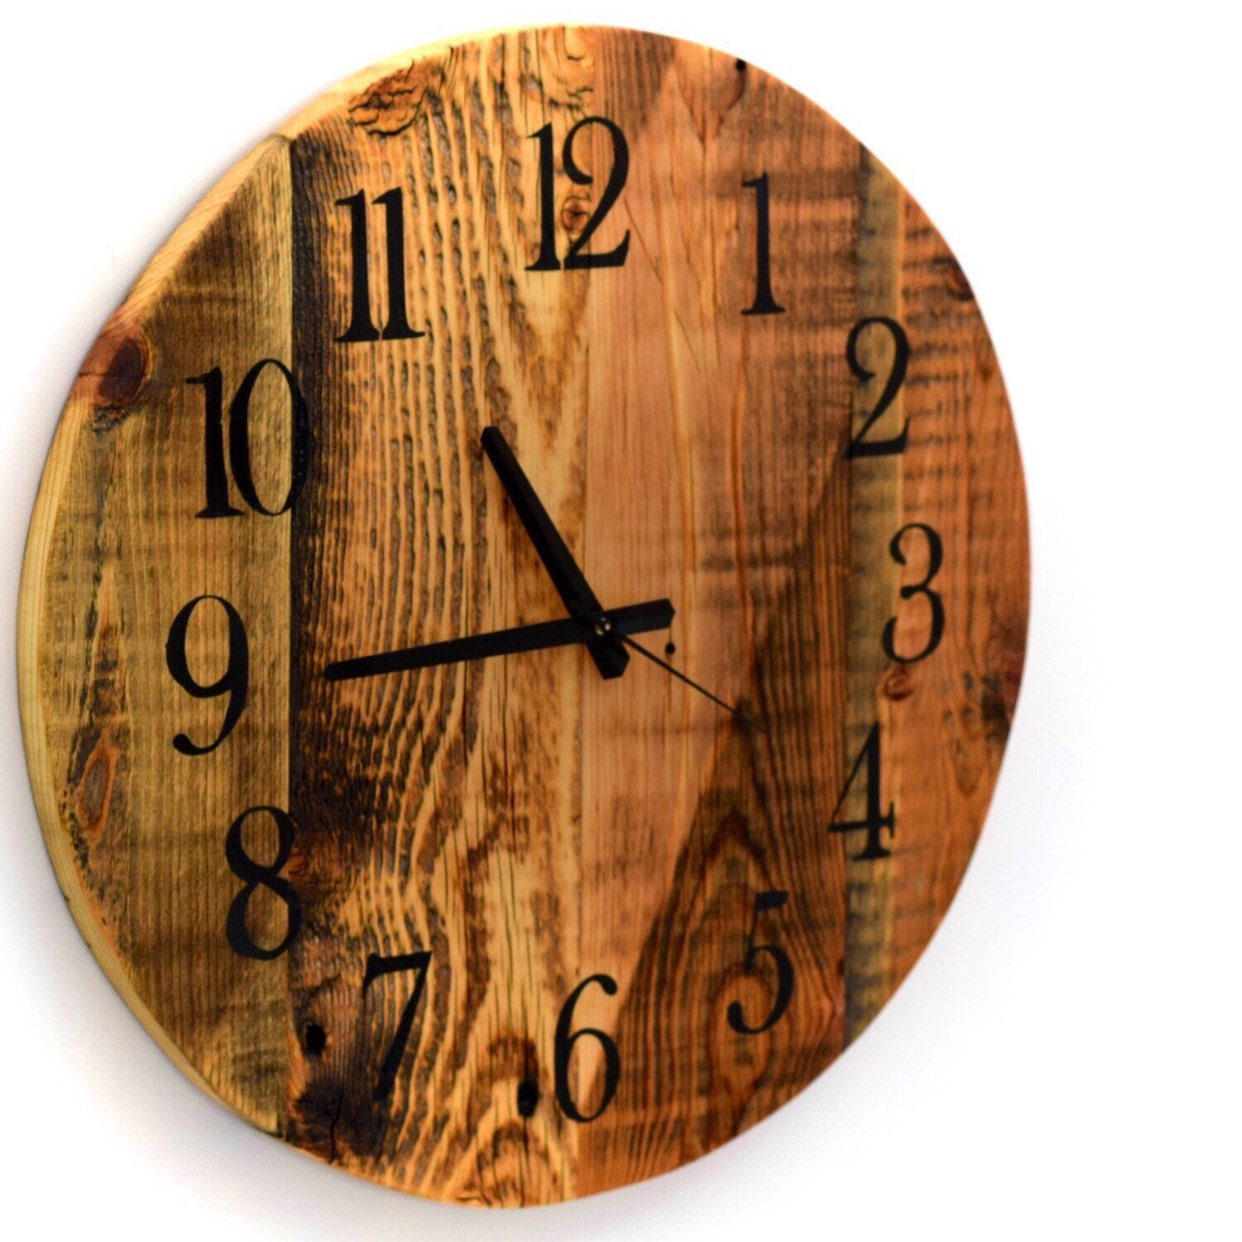 Reclaimed Barn Wood Clock Large Round Barn Wood Wall Clock